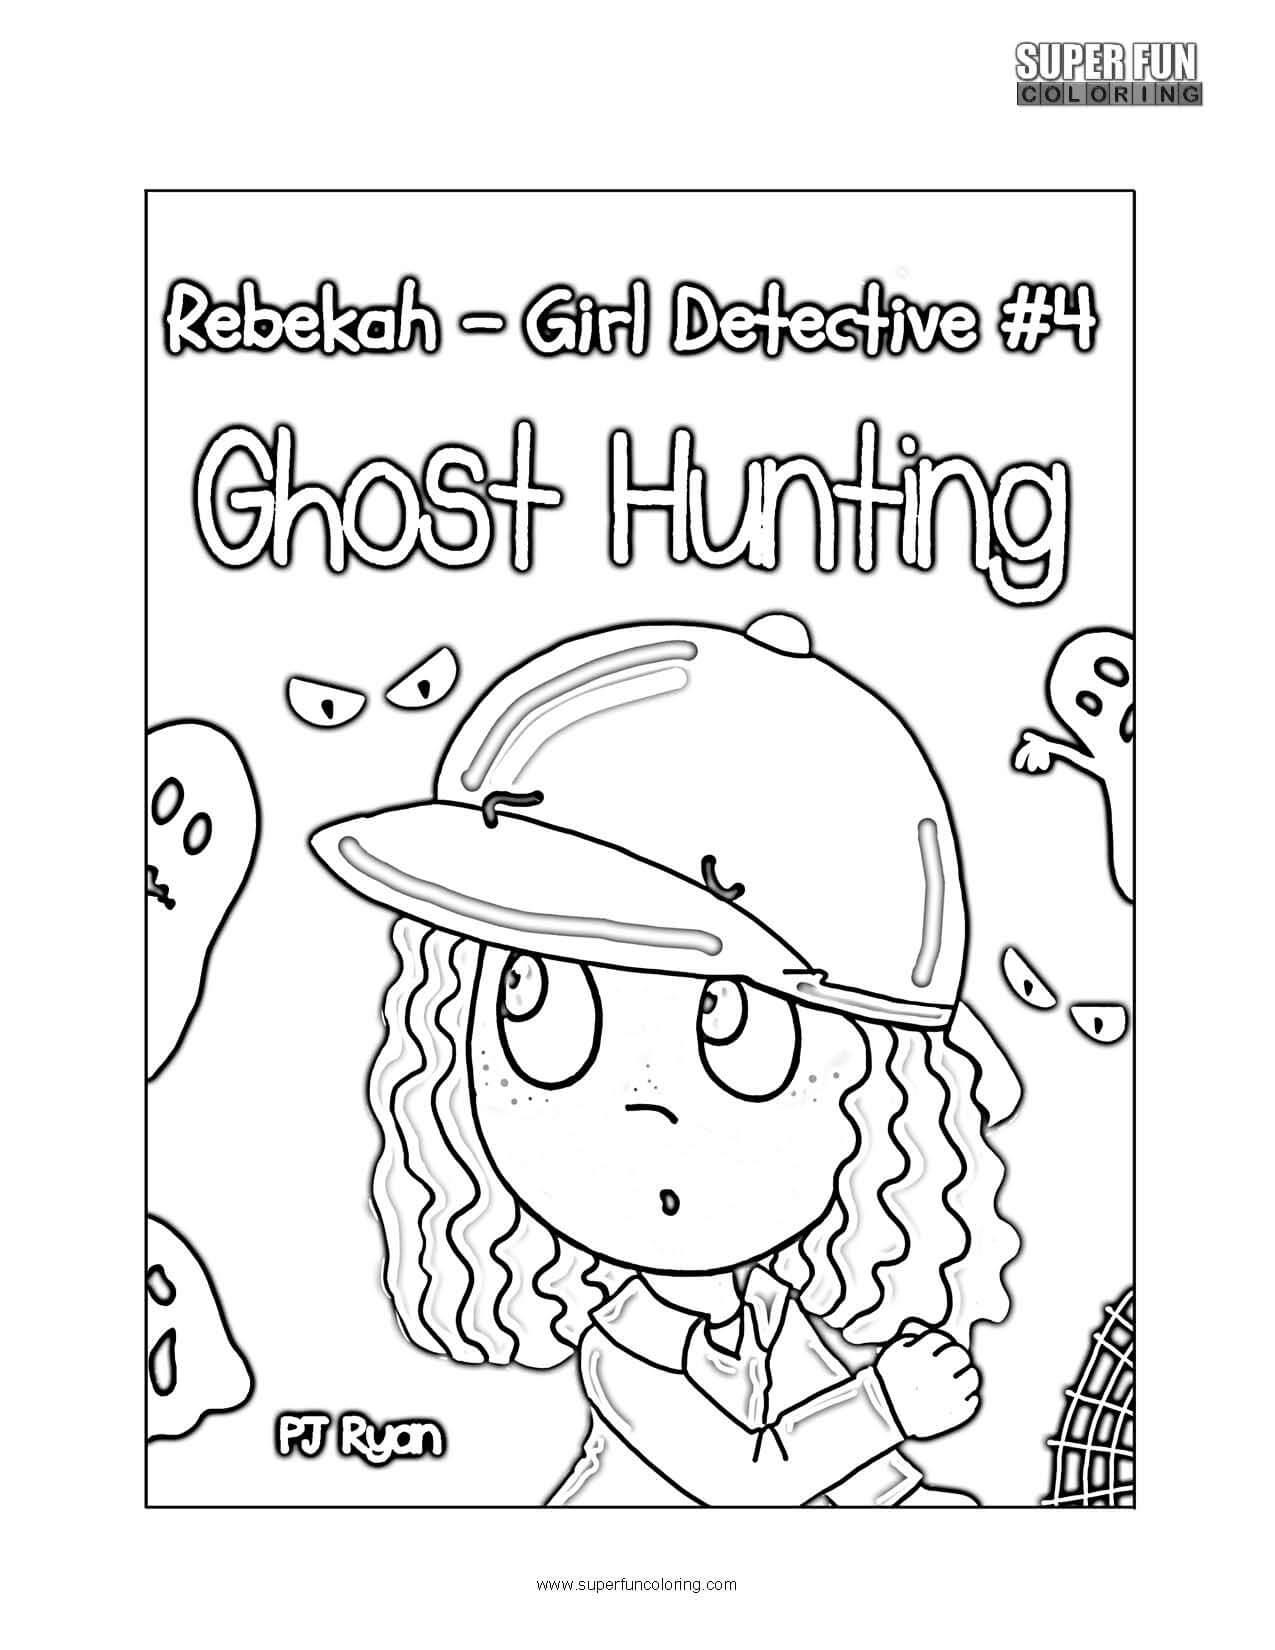 Rebekah Girl Detective Coloring Page phone app